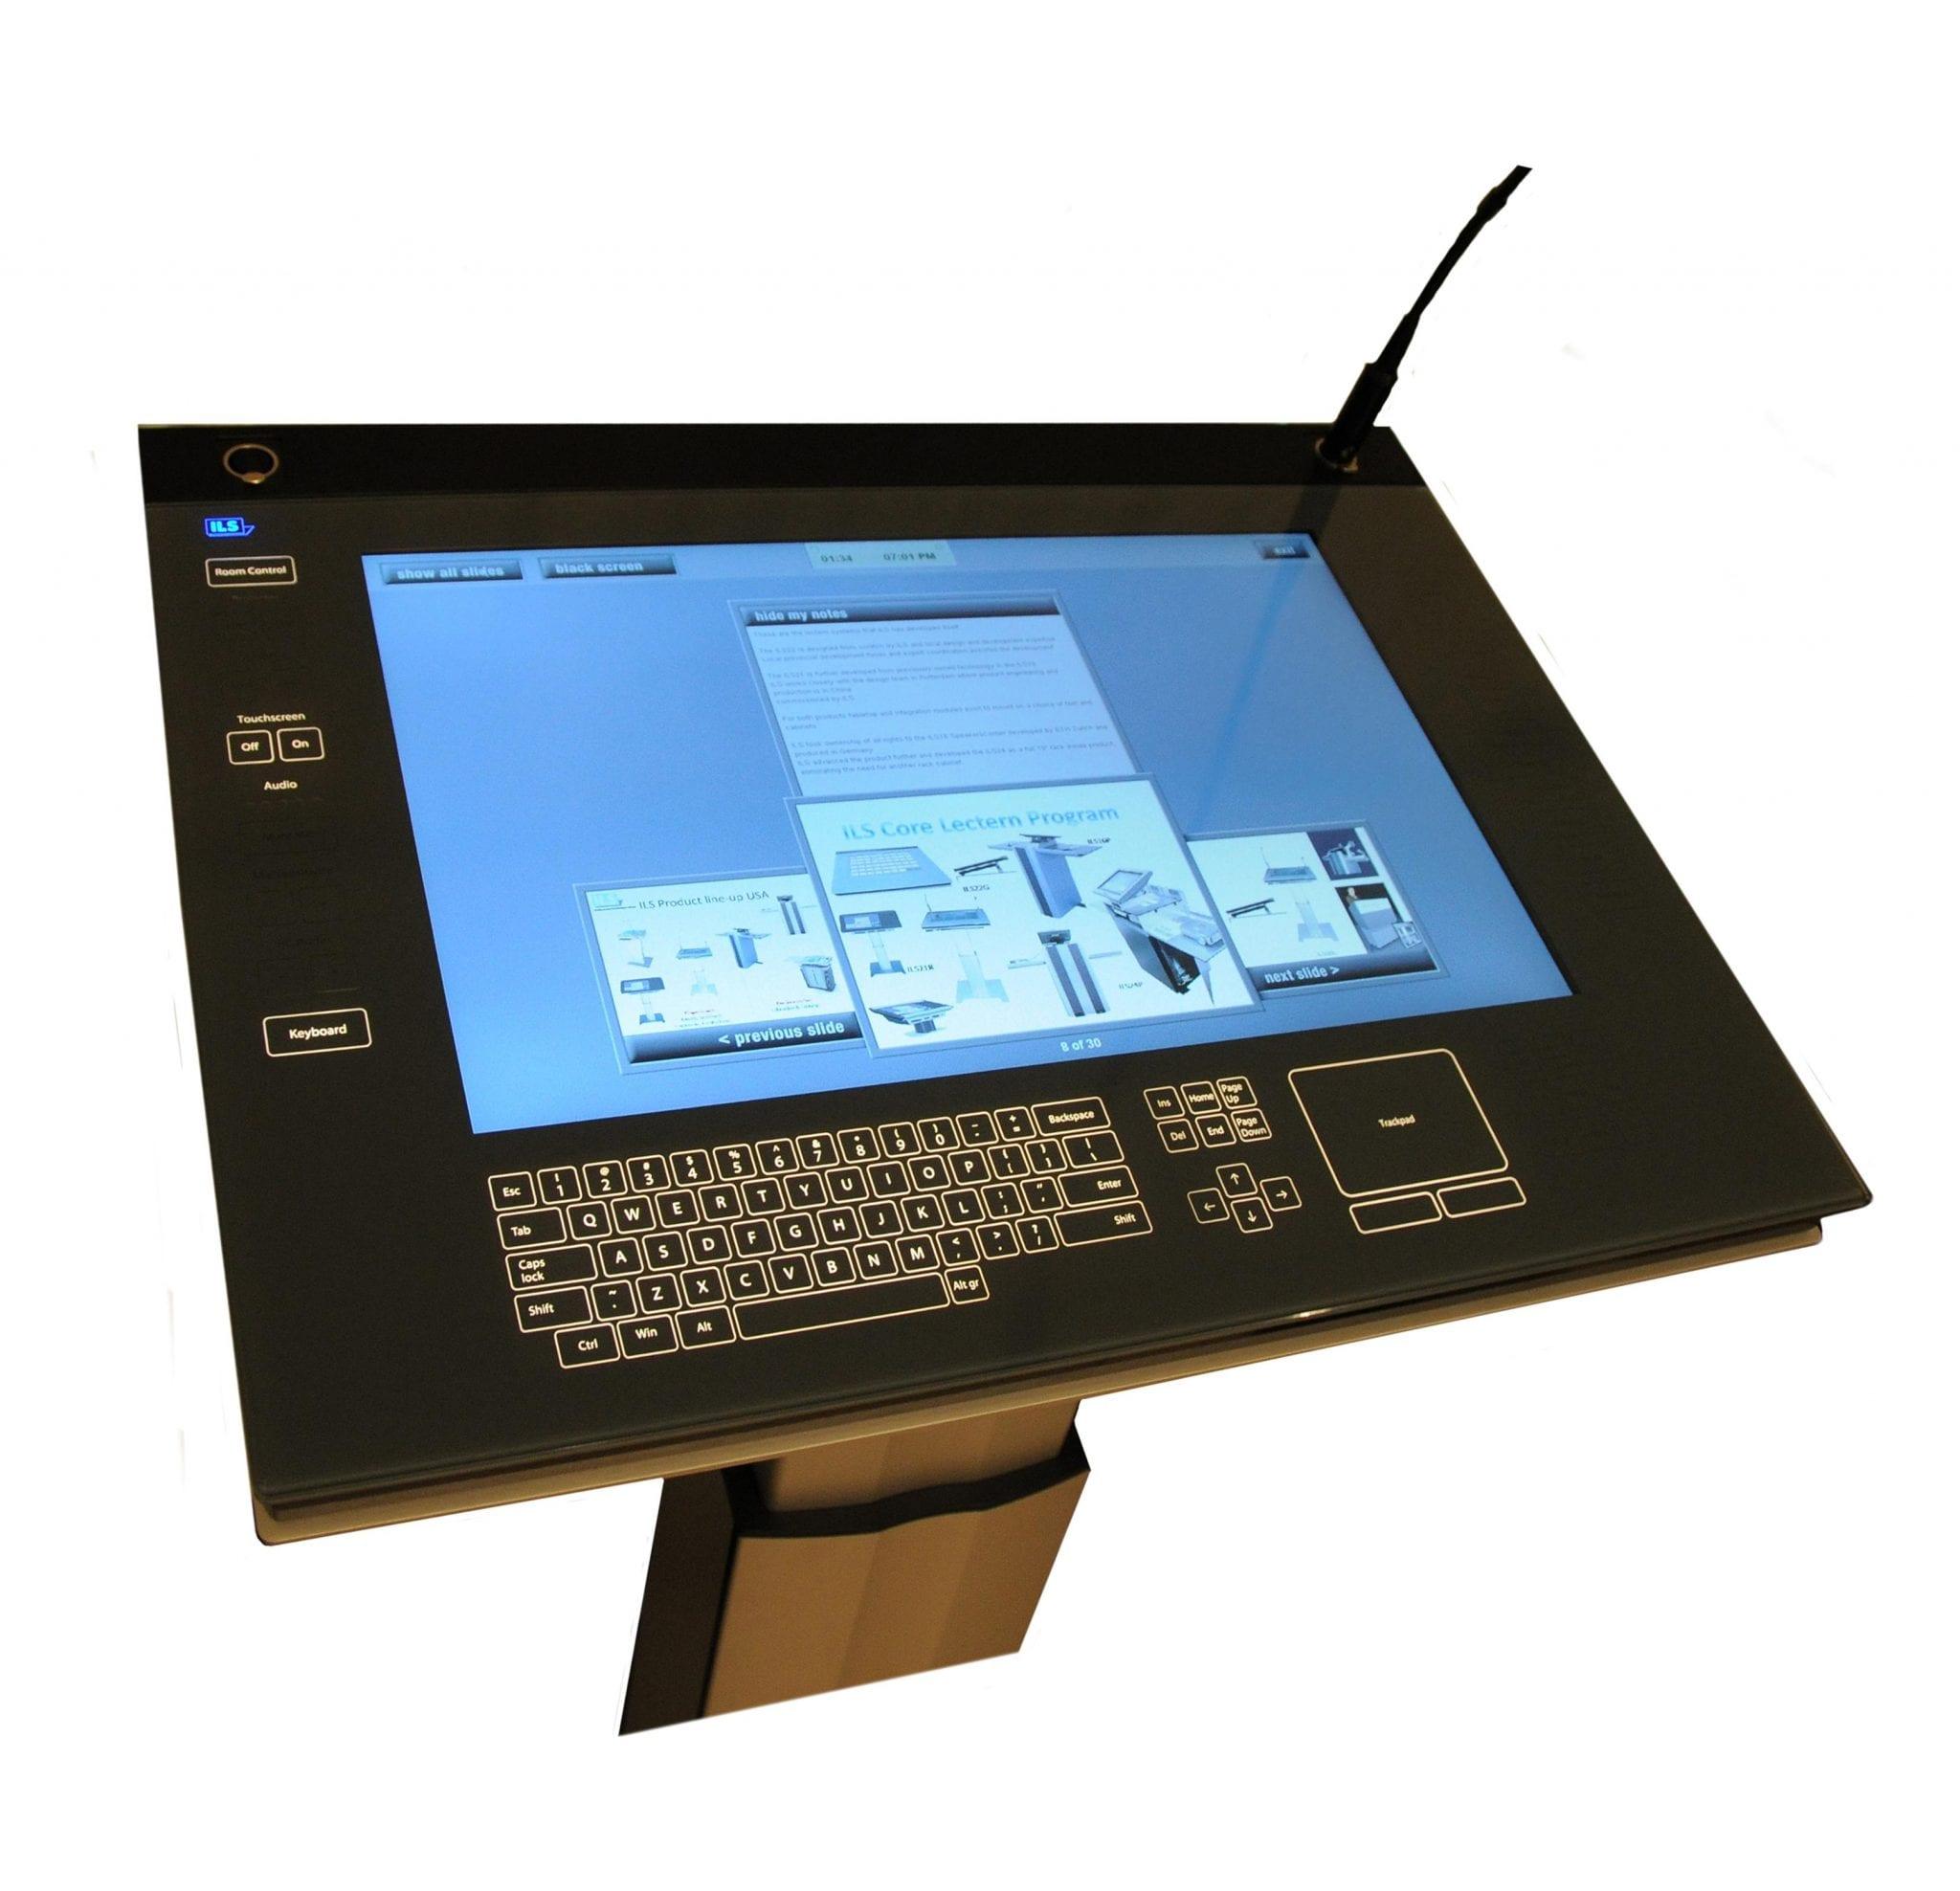 A close up of Zytronics Lectern displayscreen